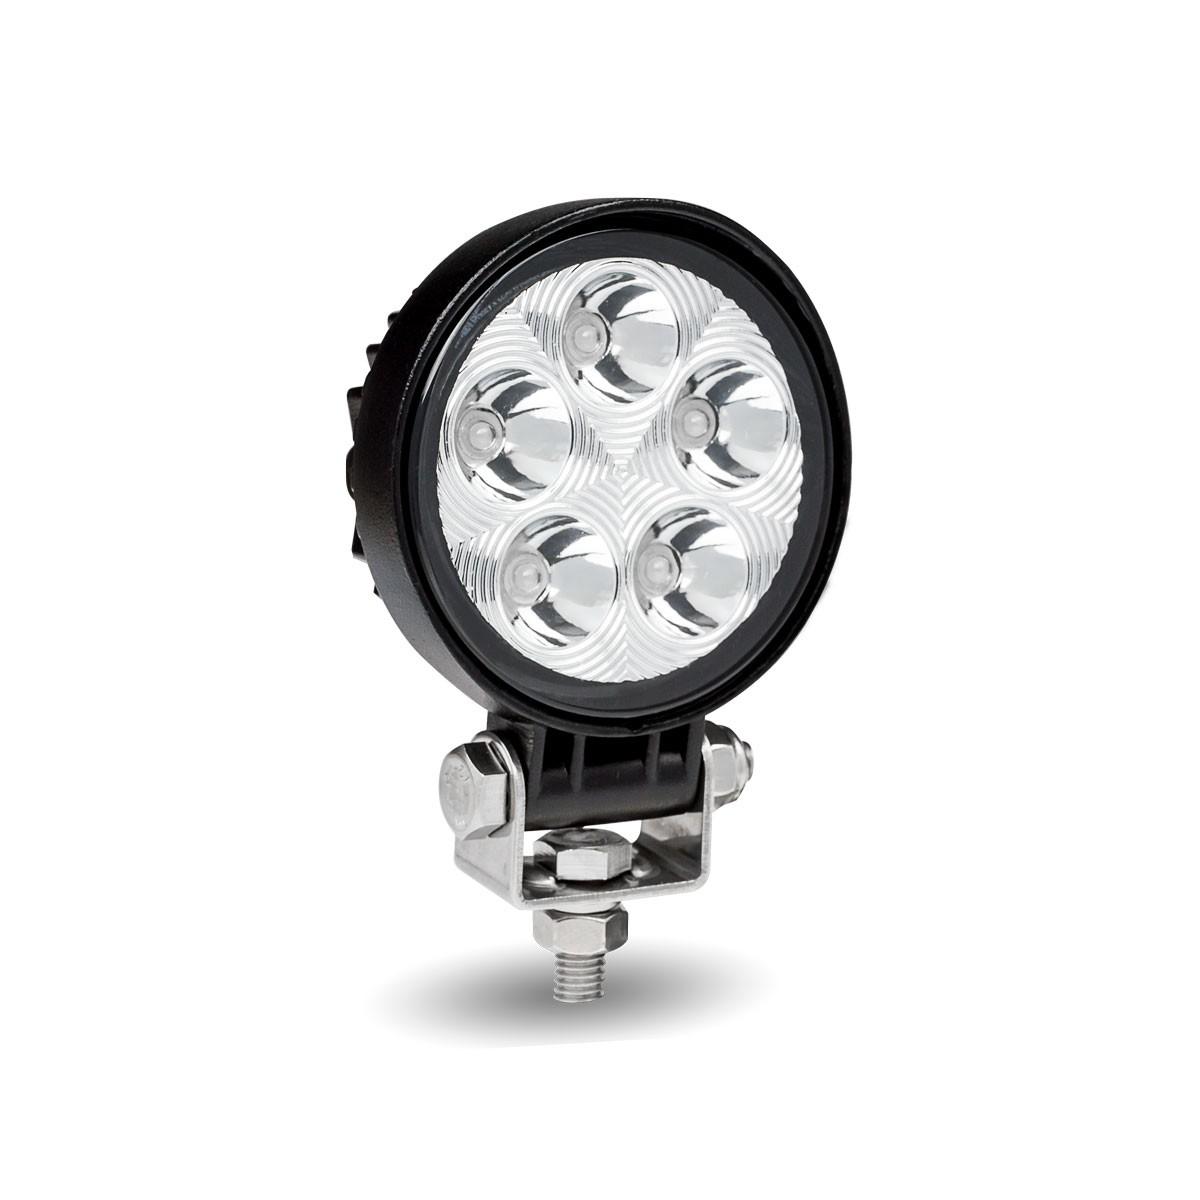 Mini Round U0027Stellar Seriesu0027 LED Work Lamp (Spot Beam | 1200 ...